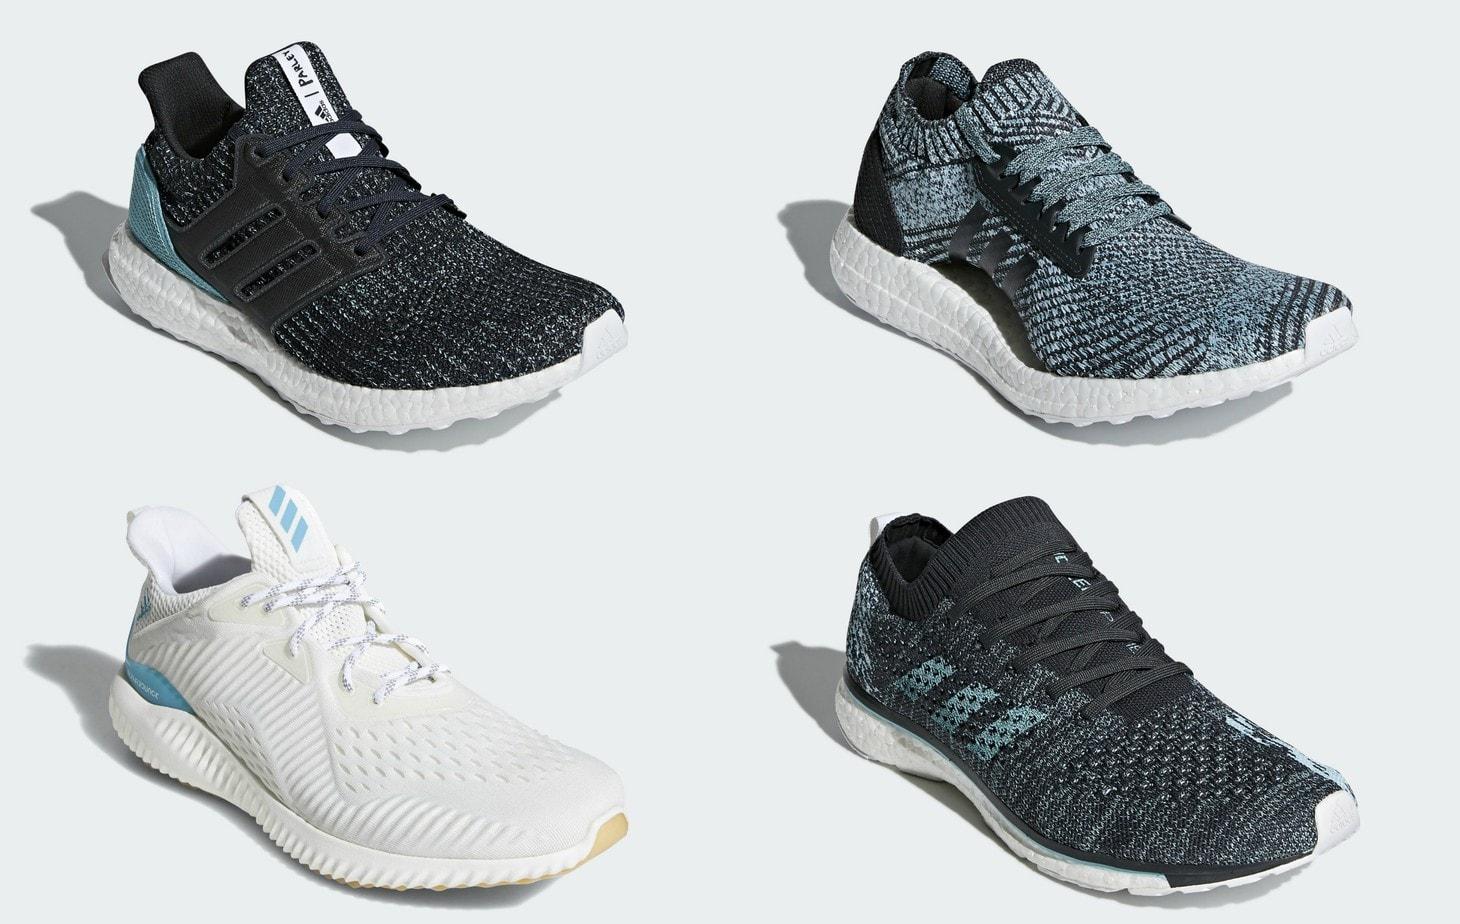 parley x adidas raccolta aprile 2018 justfreshkicks